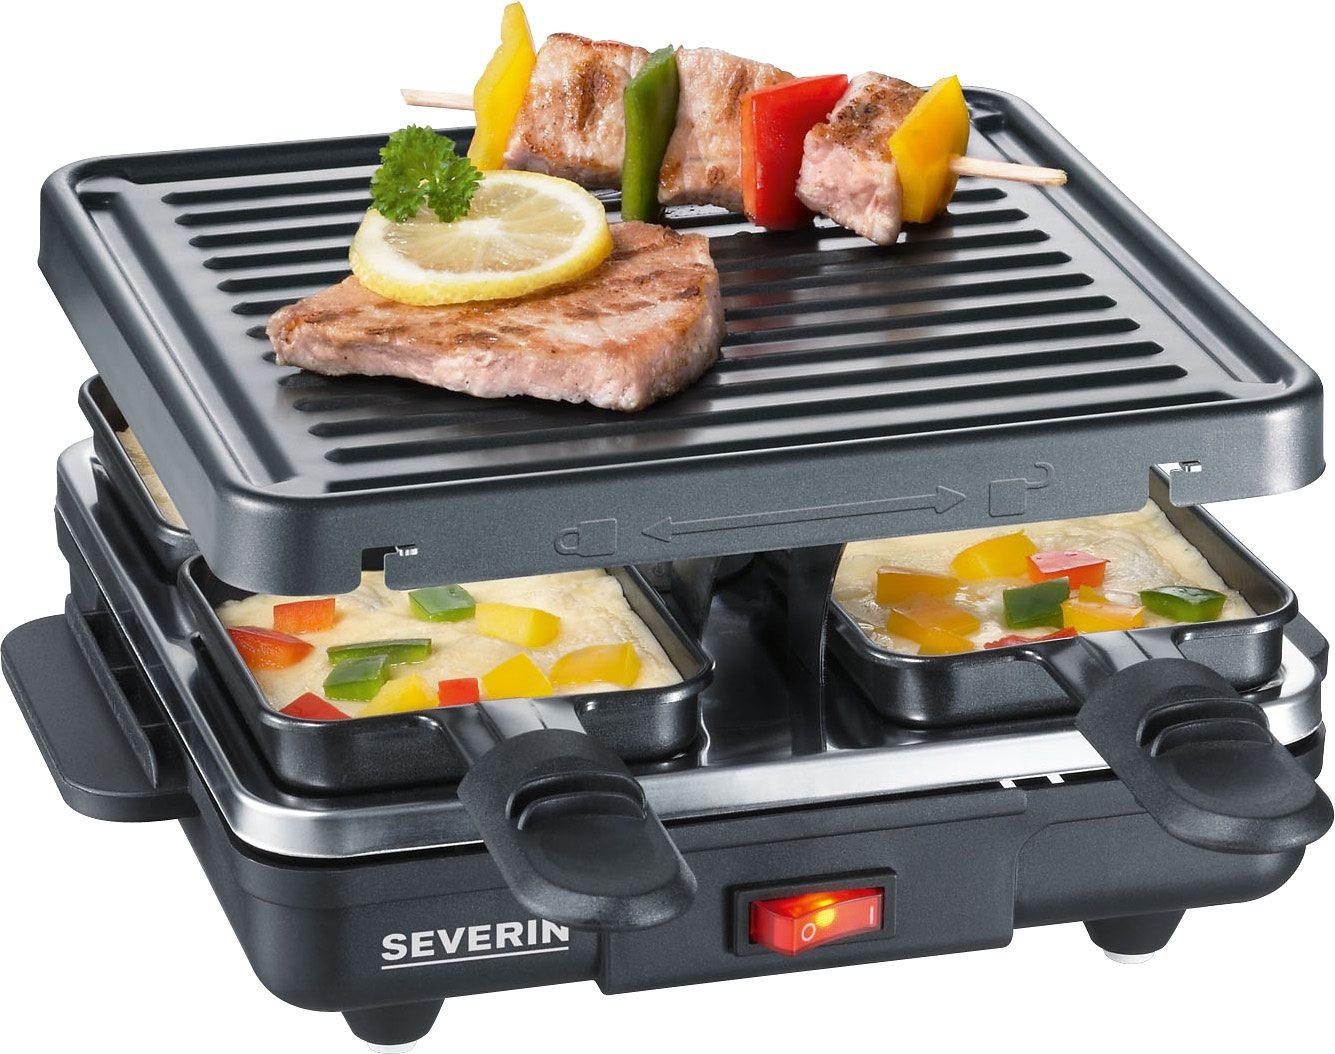 Severin Elektrogrill Idealo : Tefal raclette grill preisvergleich u2022 die besten angebote online kaufen